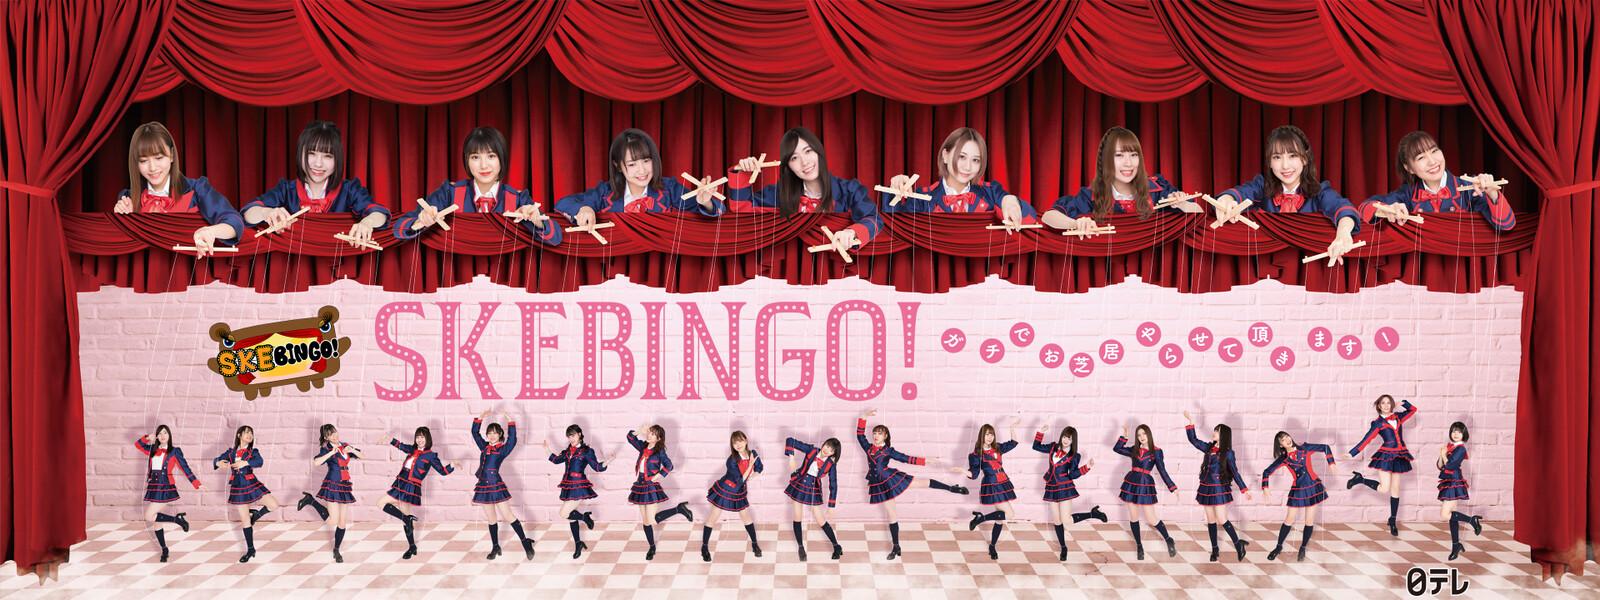 SKE48×SKEBINGO!Huluでリアルタイム配信決定